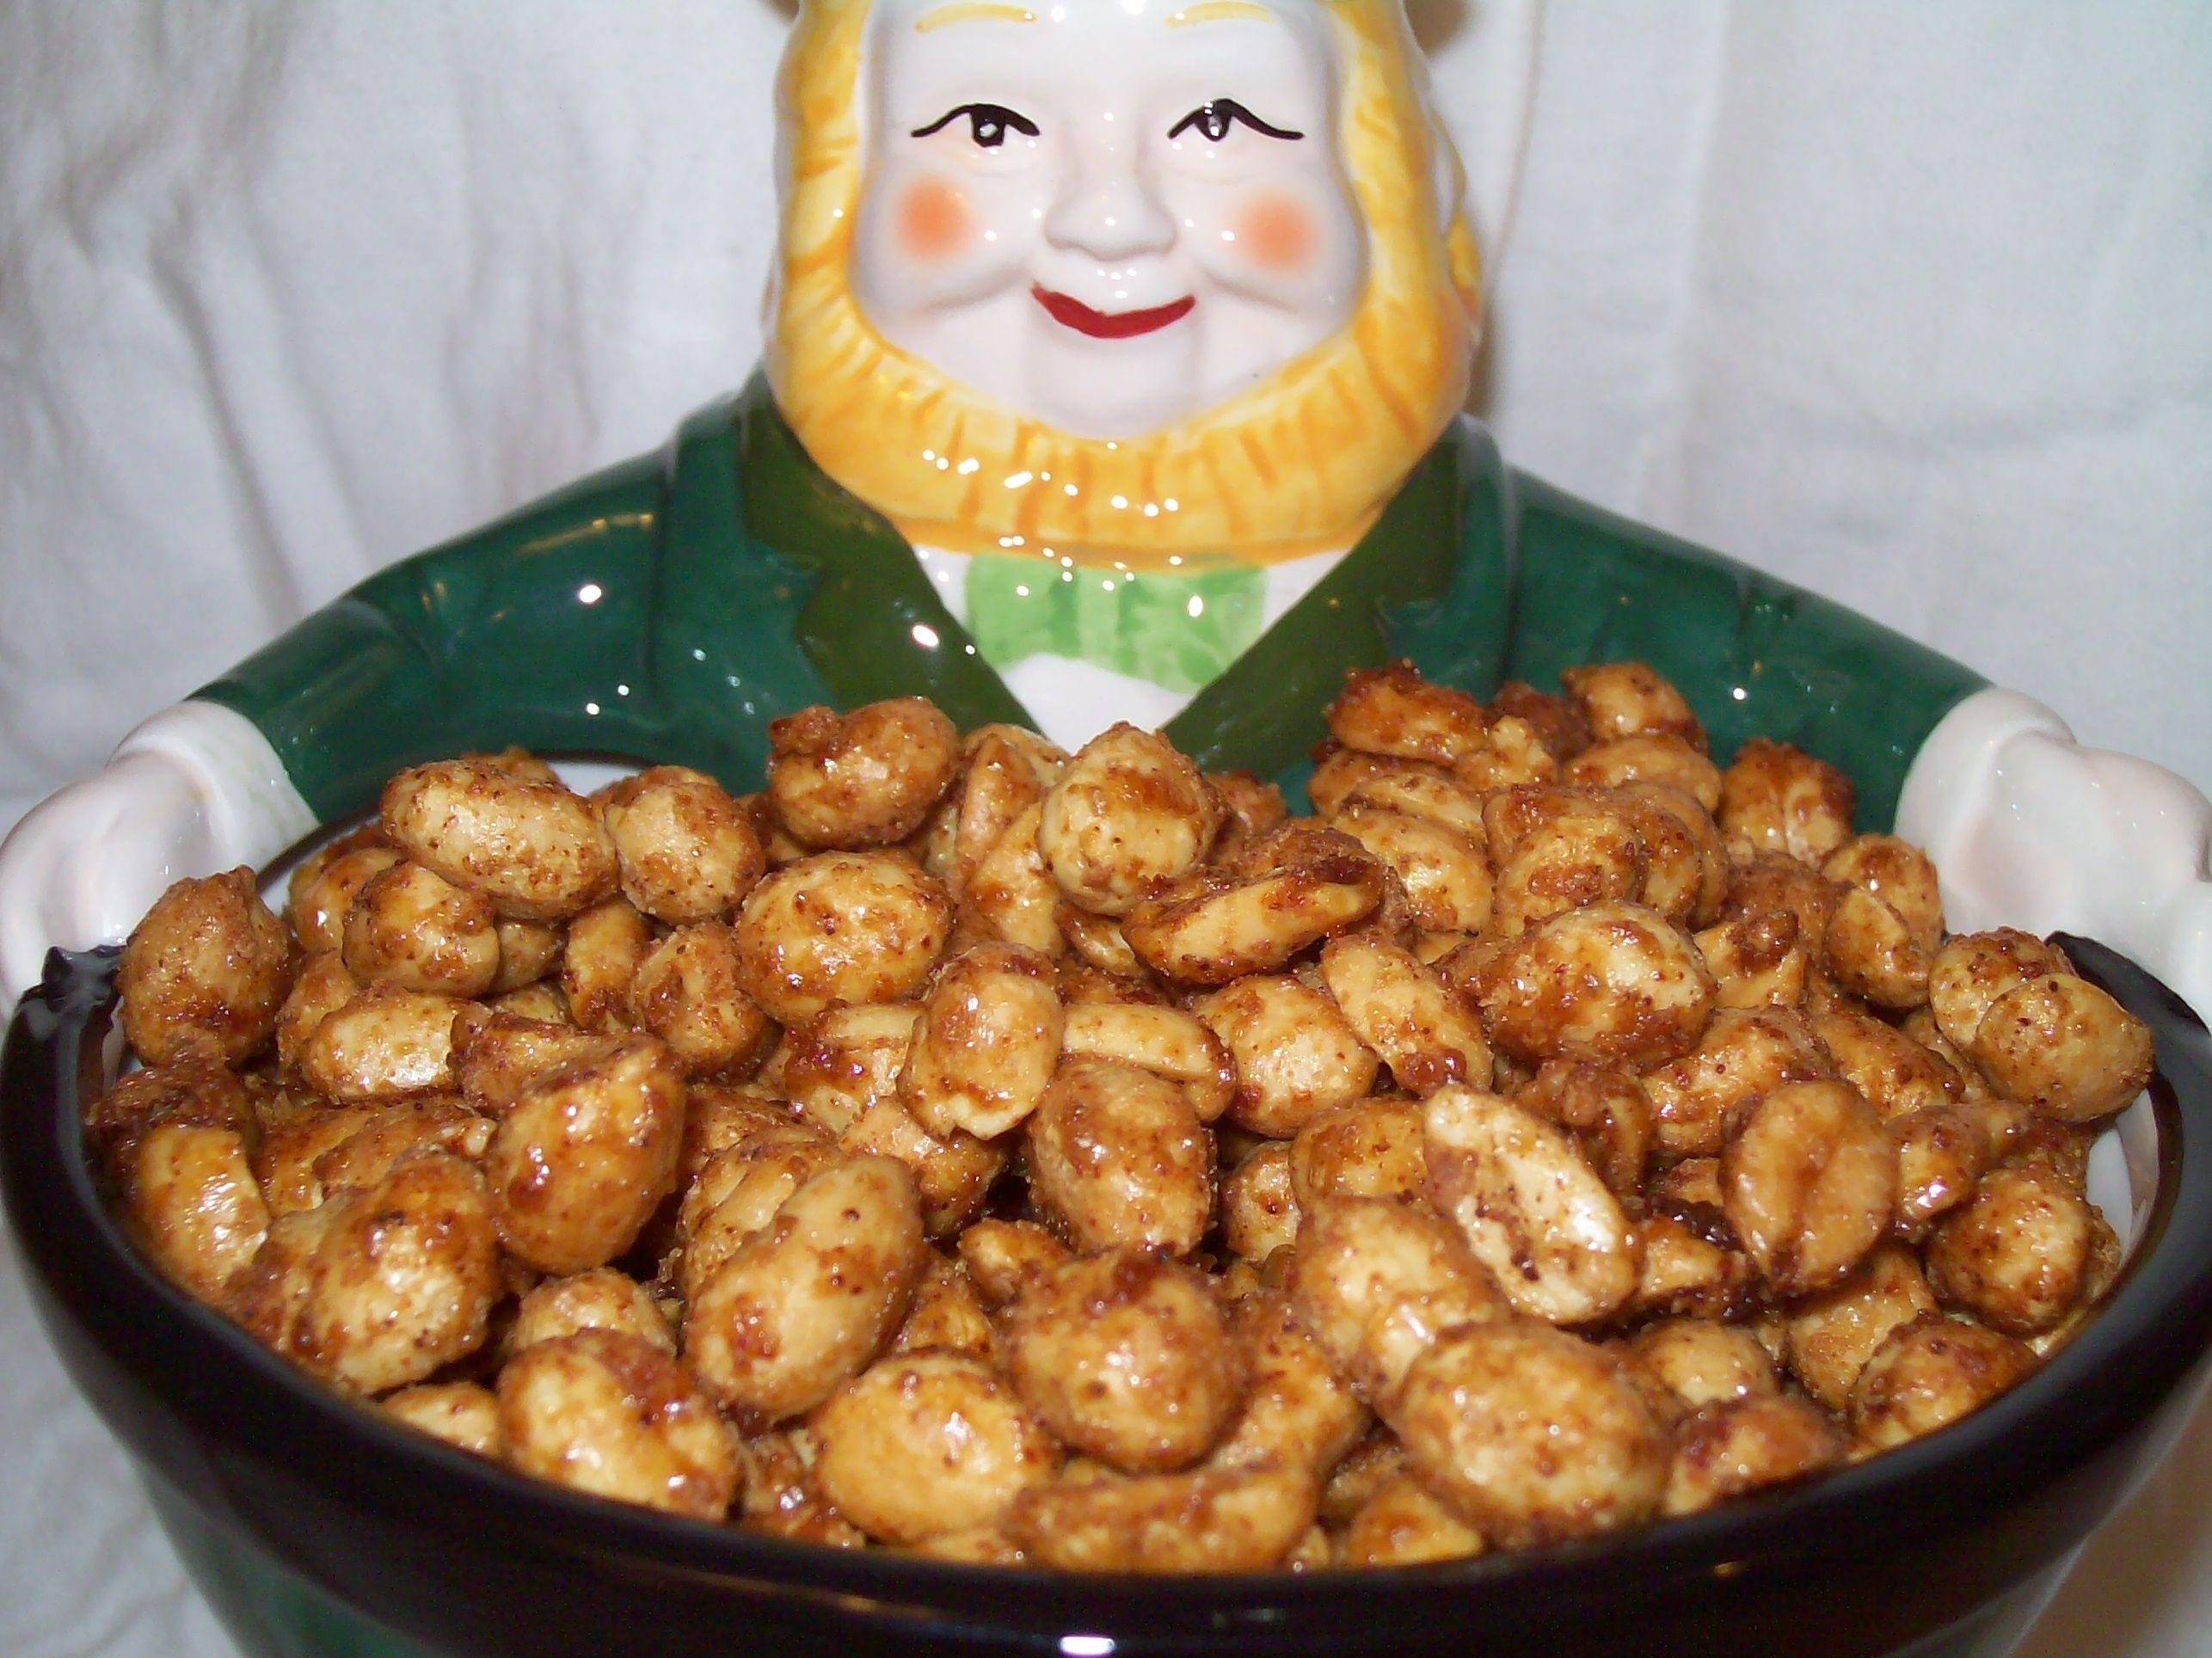 Bbq peanuts recipe recipe peanut recipes